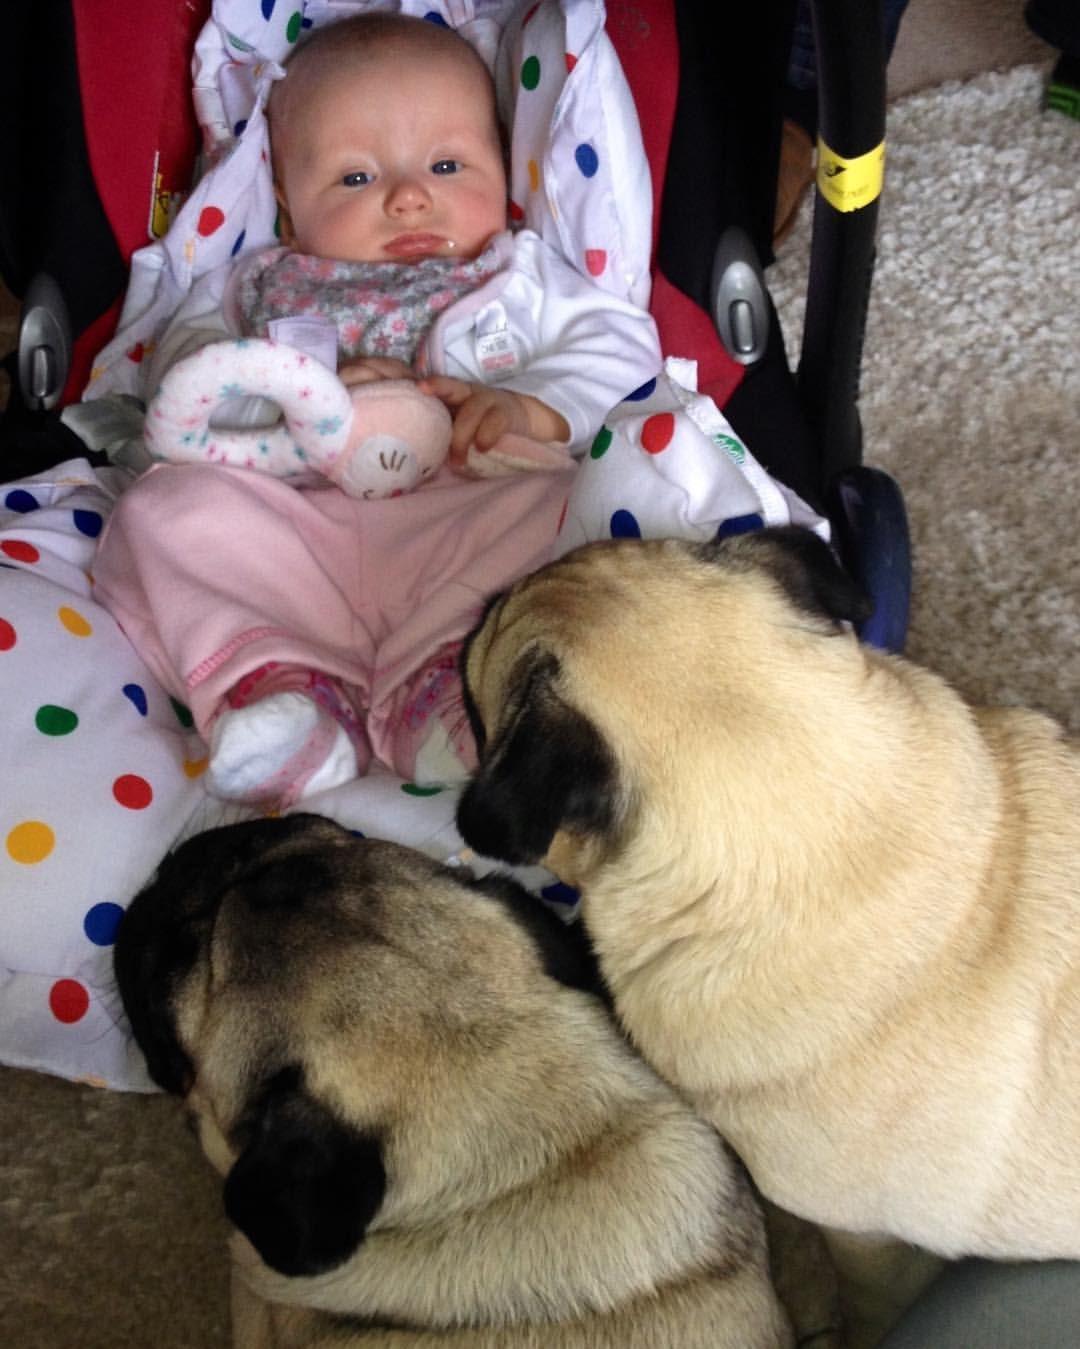 #throwbackthursday to when we were the best guard pugs to our hooman niece ❤️ #macpugs #qtpugs #purepugspp #pug #pugs #pugsofinstagram #pugbasement #pugsproud_feature #badasspugclub #bubblebeccahat #DailyDoseOfPugs #eddthepug #flatnosedogsociety #gilesfriends #heyportiapickme #henrys1inamillion #itslolathepug #mysquishyliciousfriends #puglife #speakpug #squishyfacecrew #thetomcoteshow #zerozeropug #instapug #pugsyouwilllove #Smilingpugs #obsessedwithpugs